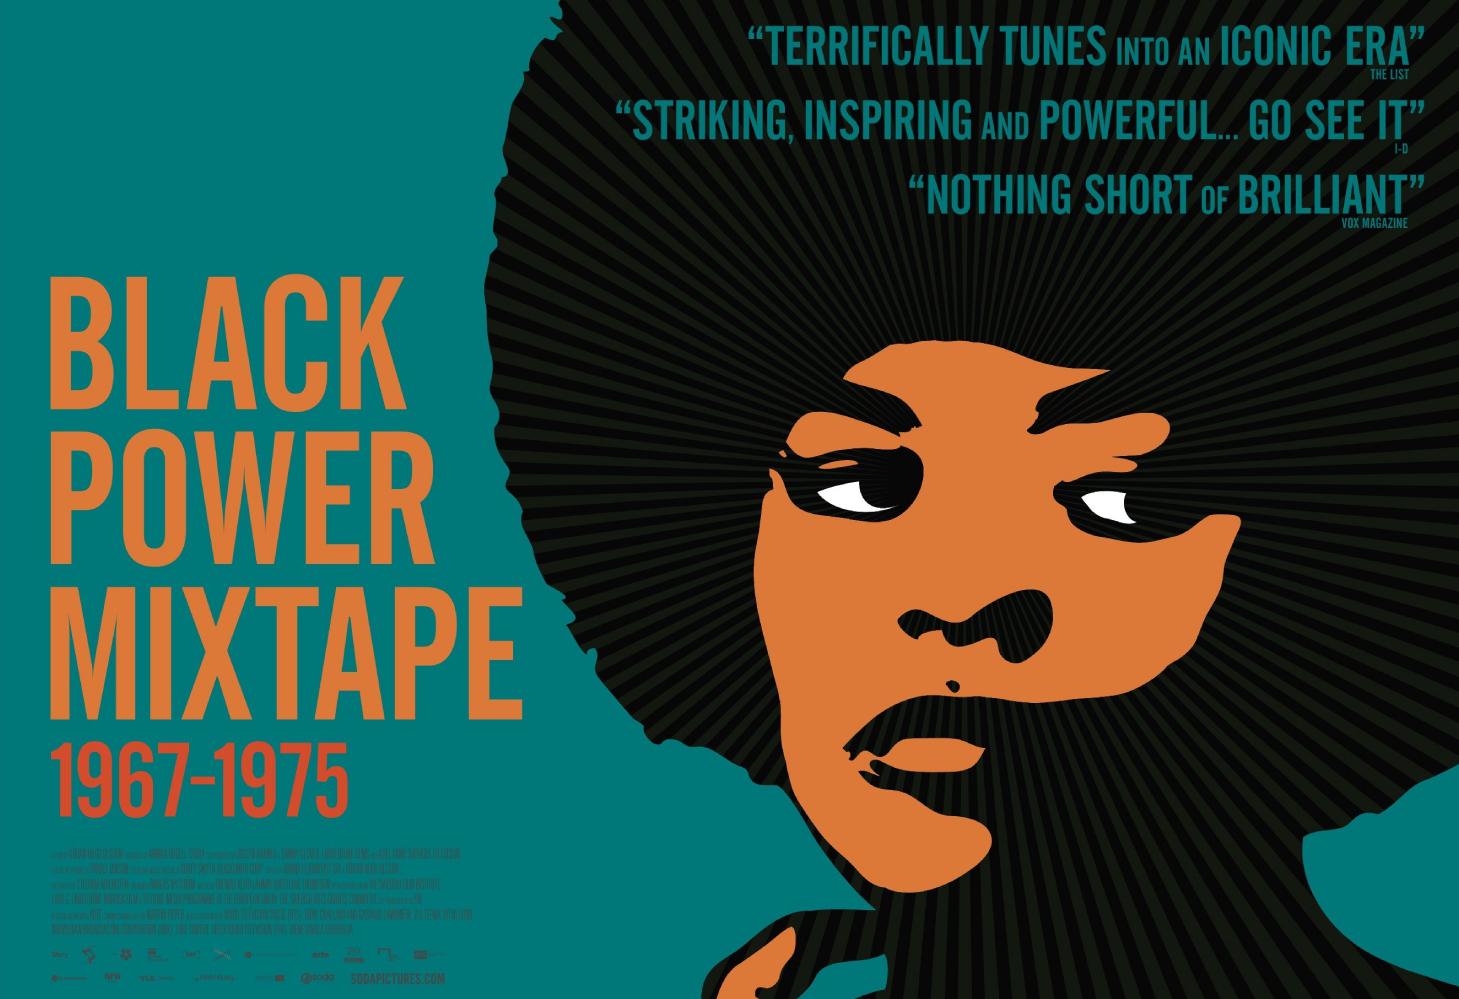 Black Power Mixtape poster